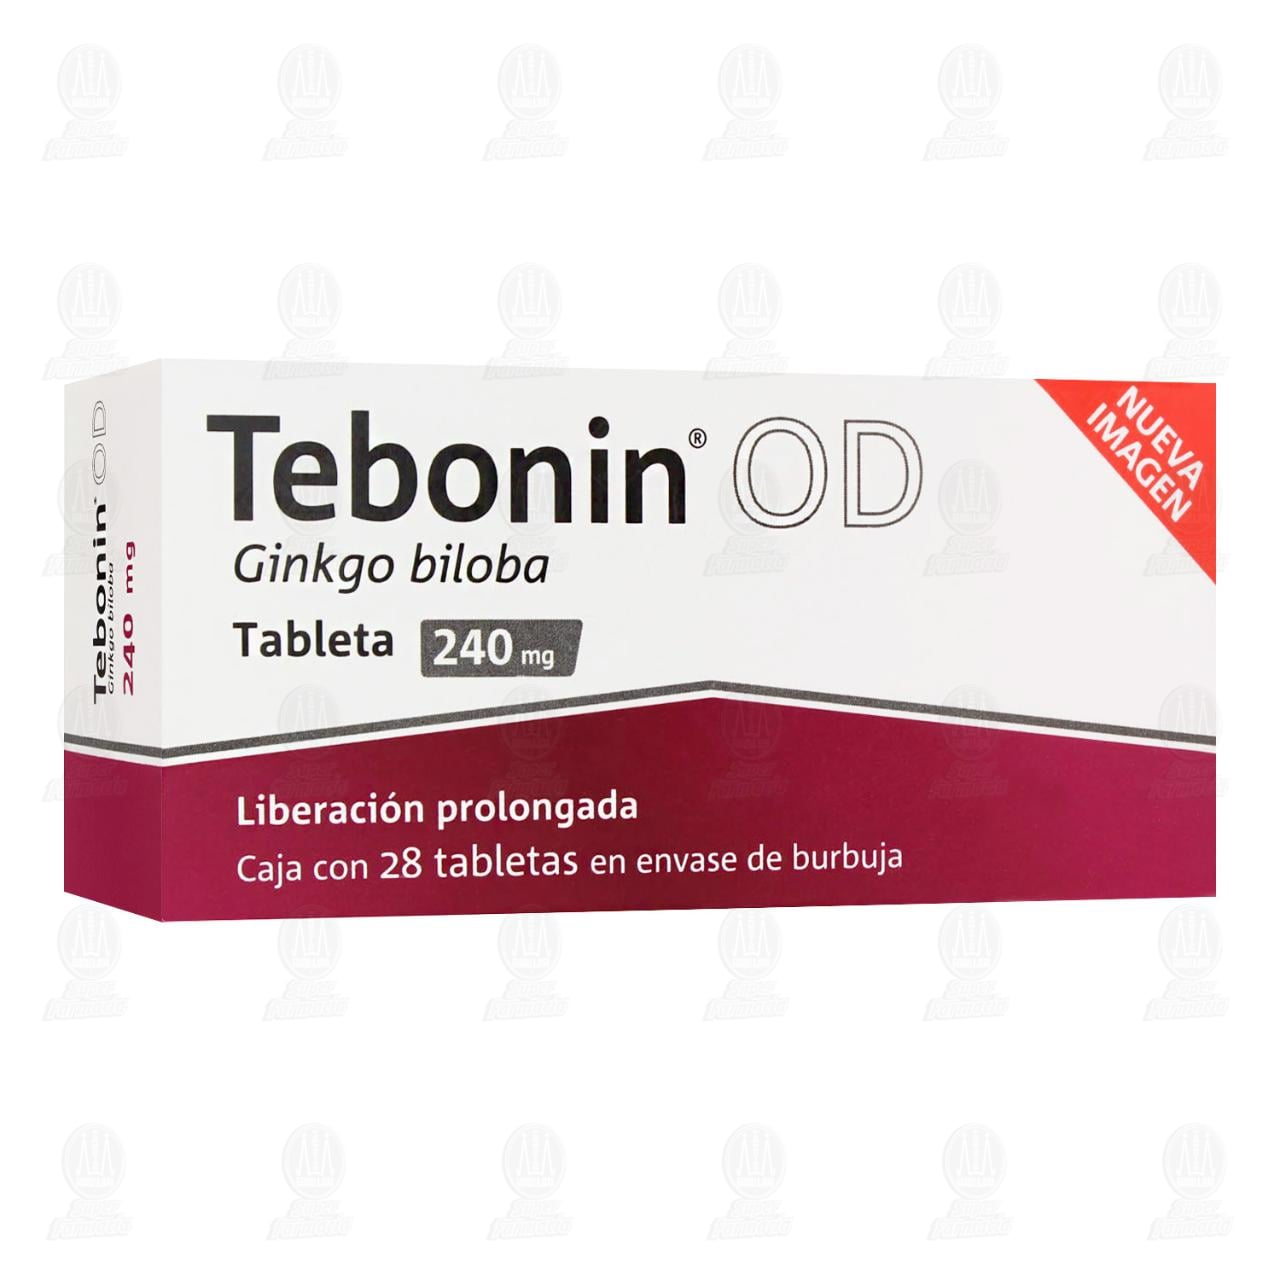 Comprar Tebonin OD 240mg 28 Tabletas en Farmacias Guadalajara